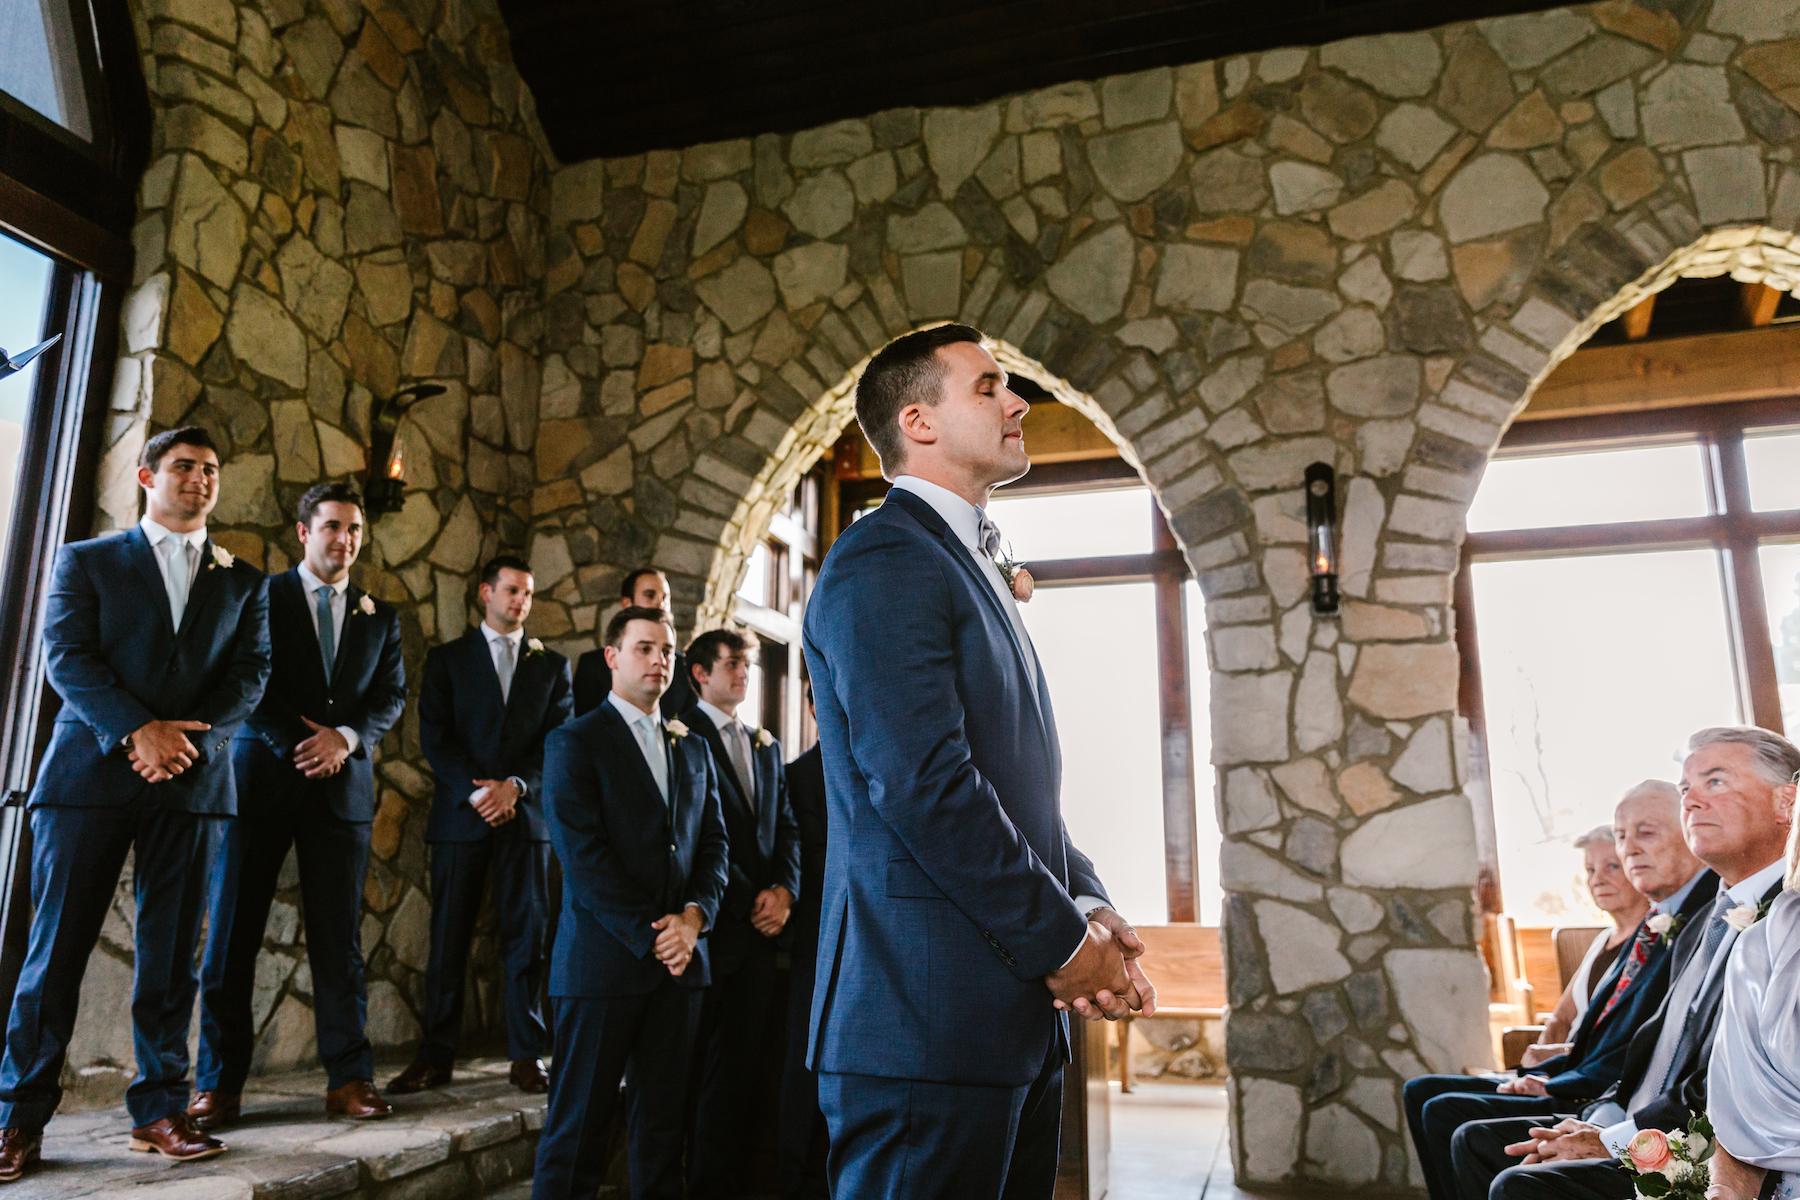 wedding-engagement-photographer-spartanburg-greenville-columbia-carolina-south-north-477.JPG